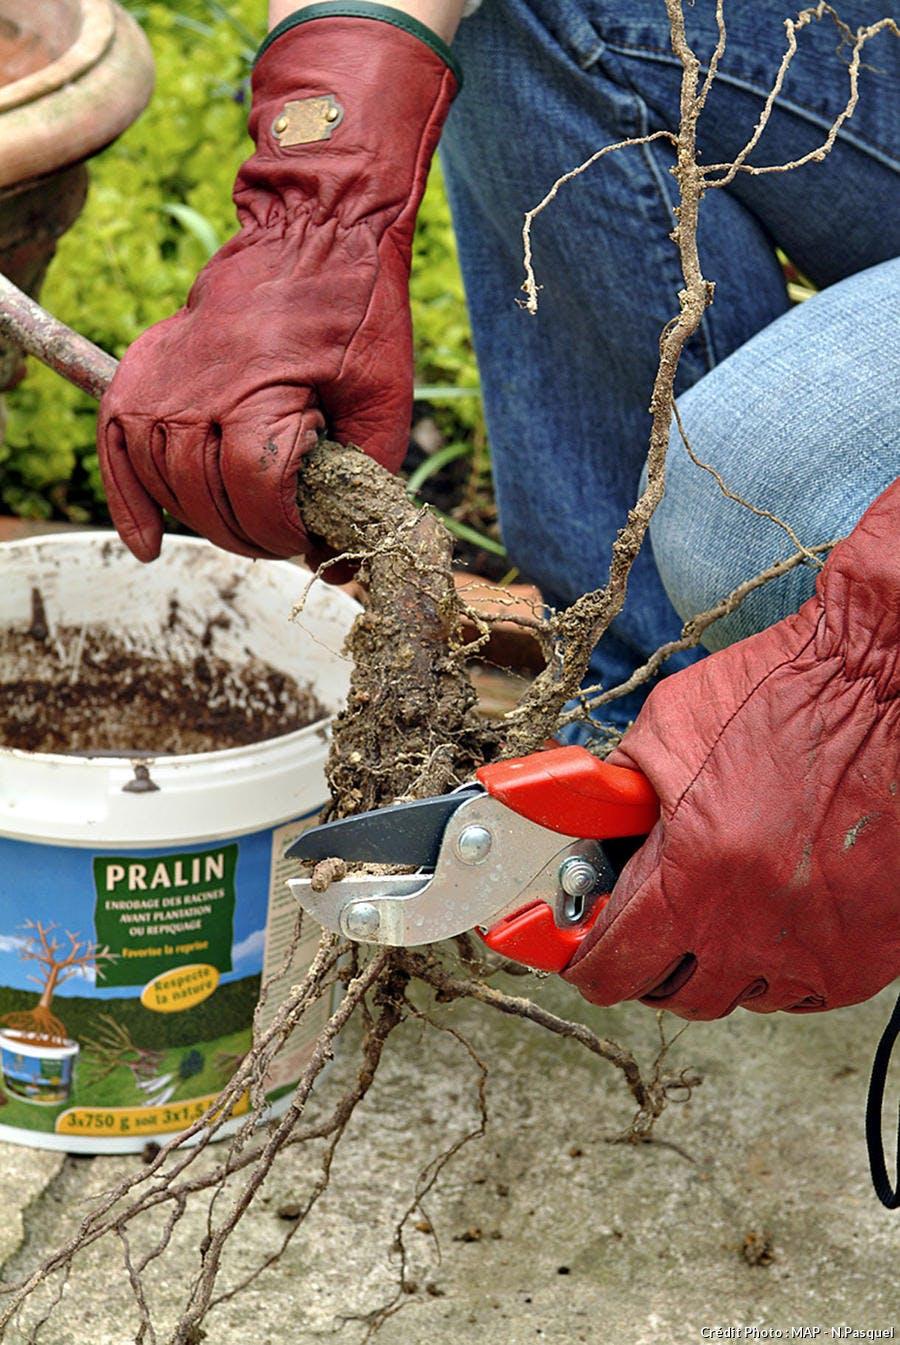 Praliner les racines